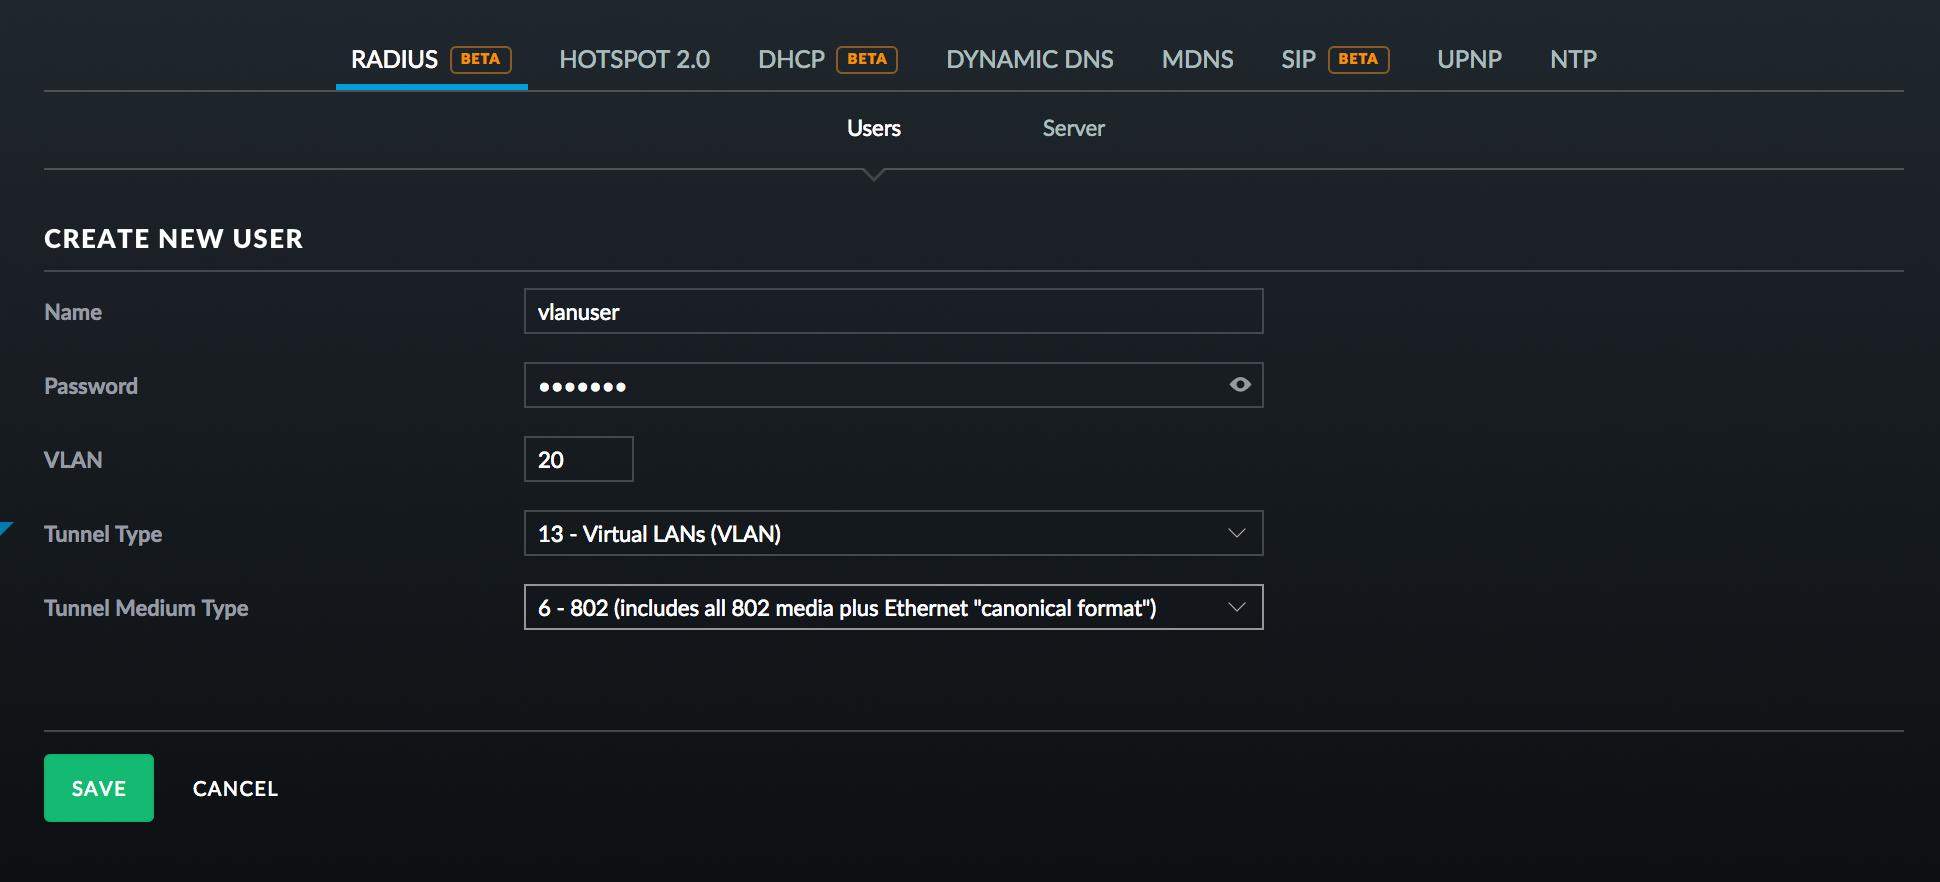 Radius users bandwidth monitoring | Ubiquiti Community